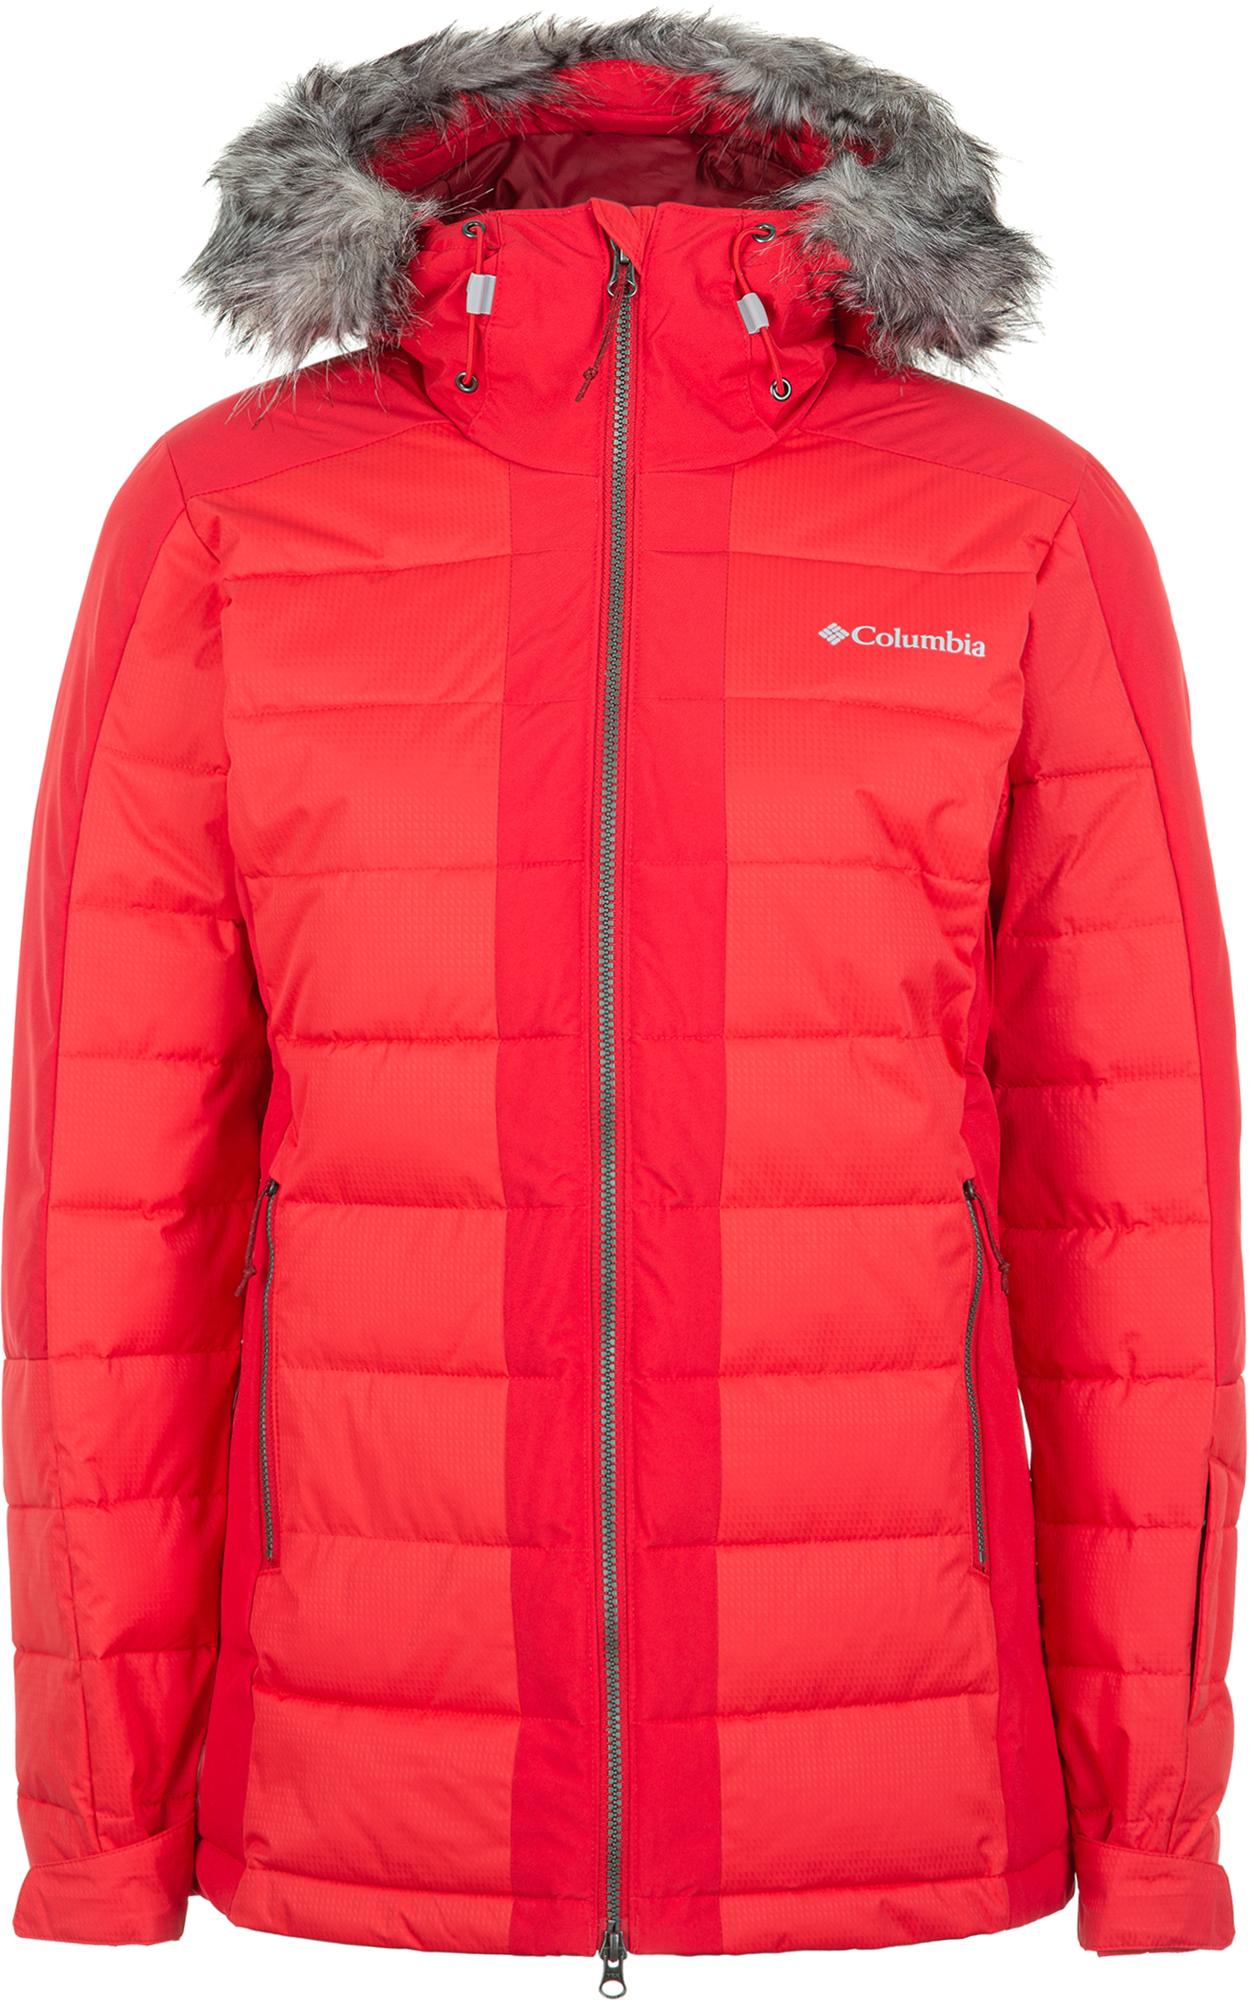 Фото - Columbia Куртка утепленная женская Columbia Harper Lake, размер 48 куртка женская trussardi цвет темно синий 36s00158 blue night размер l 46 48